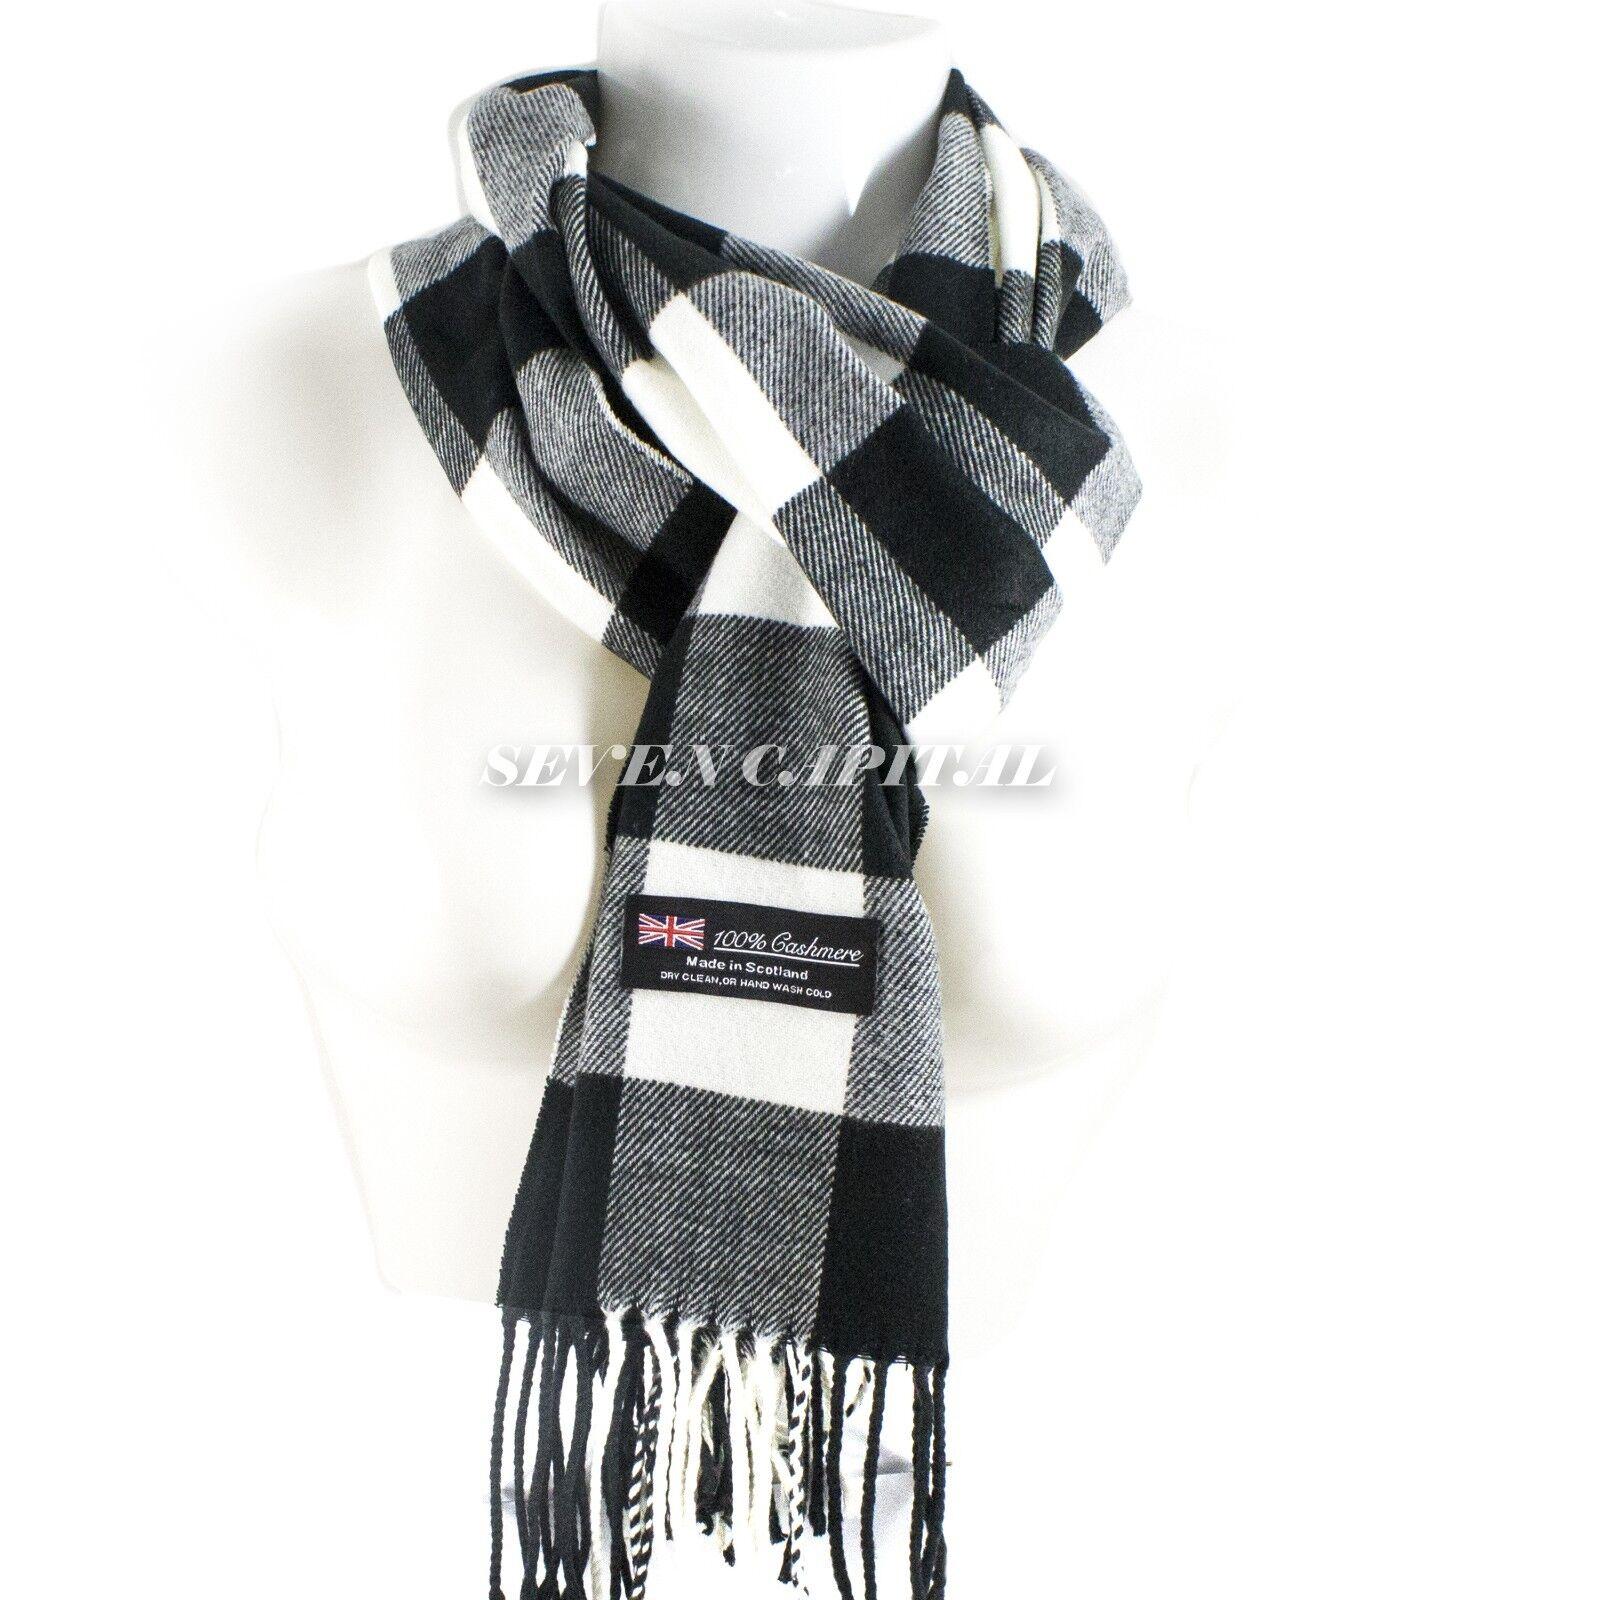 Mens Womens Winter Warm SCOTLAND Made 100% CASHMERE Scarf Scarves Plaid Wool 16. Plaid: Black/White/Grey